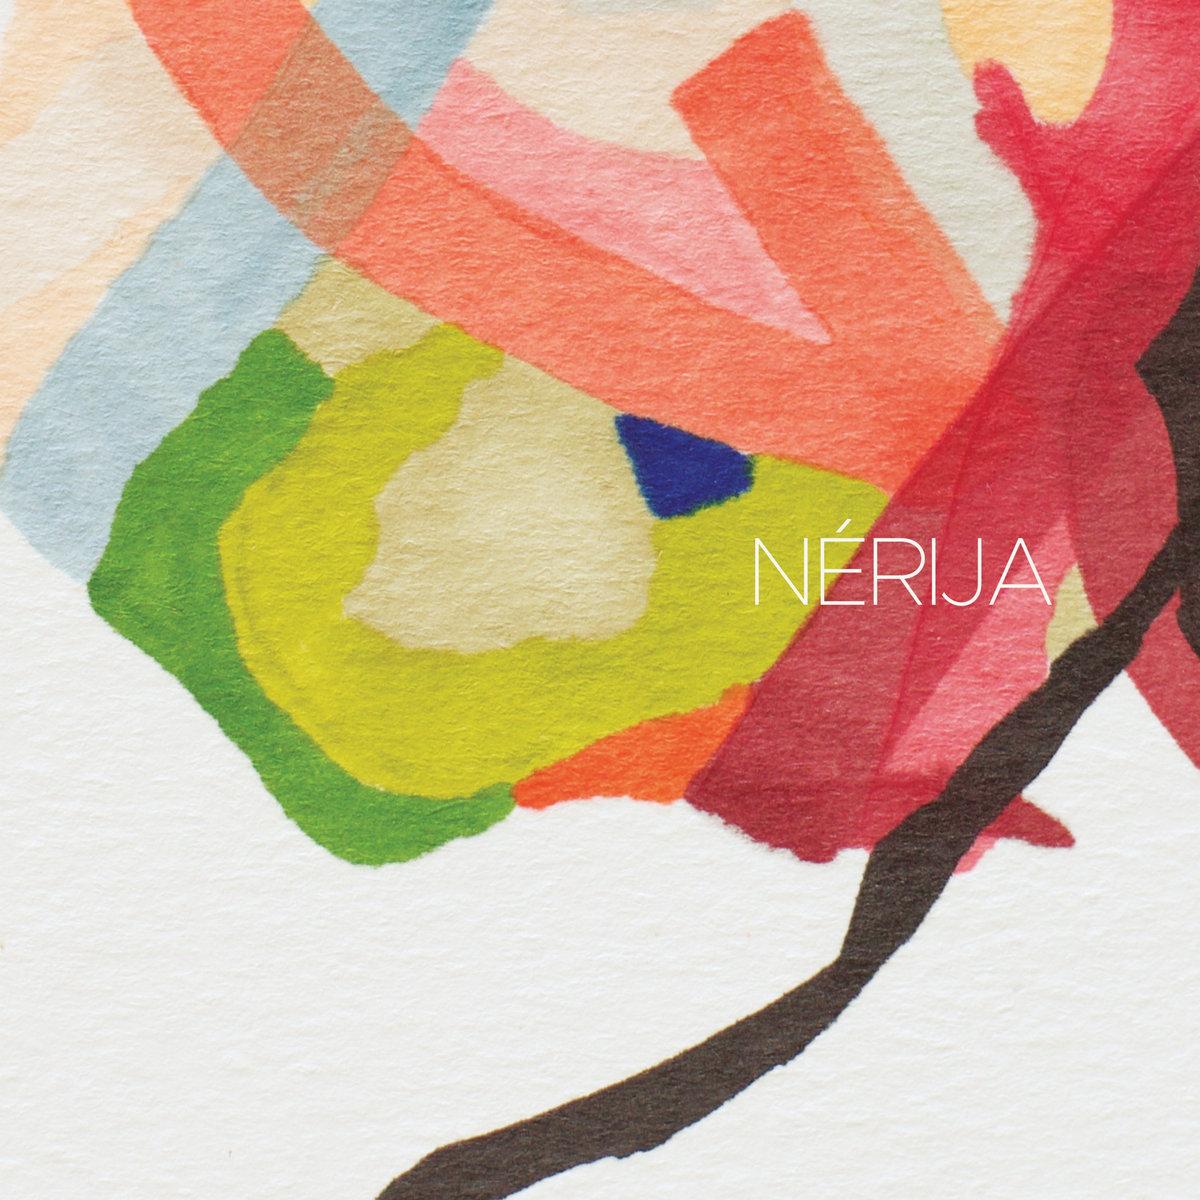 Nérija<br/>Blume<br/>Domino, 2019